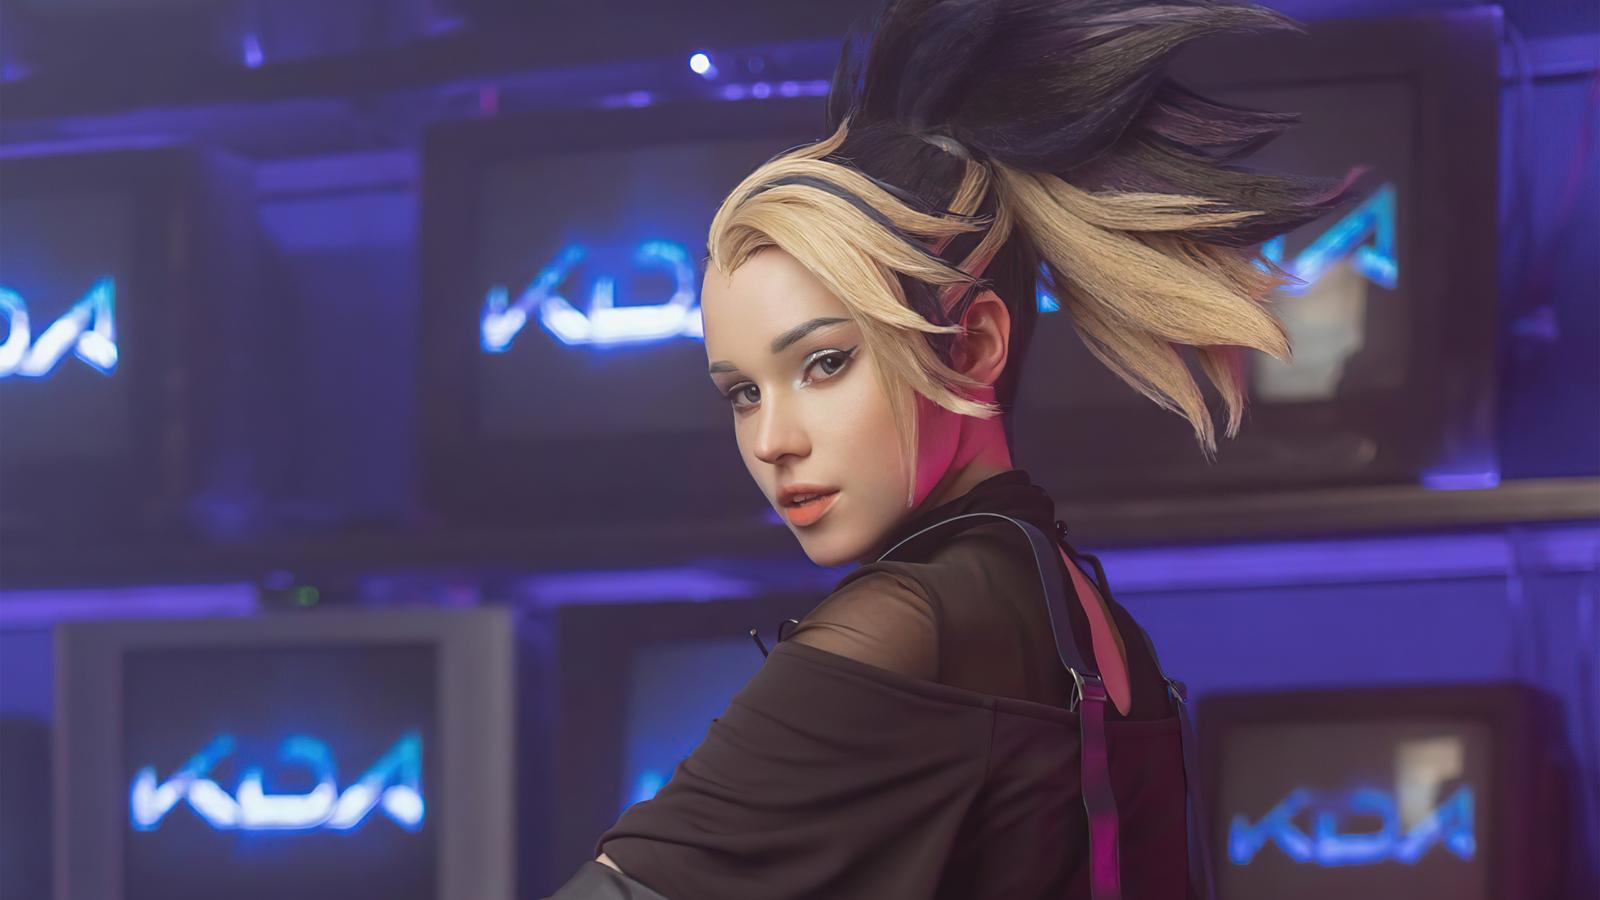 akali-kda-girl-cosplay-5k-0v.jpg